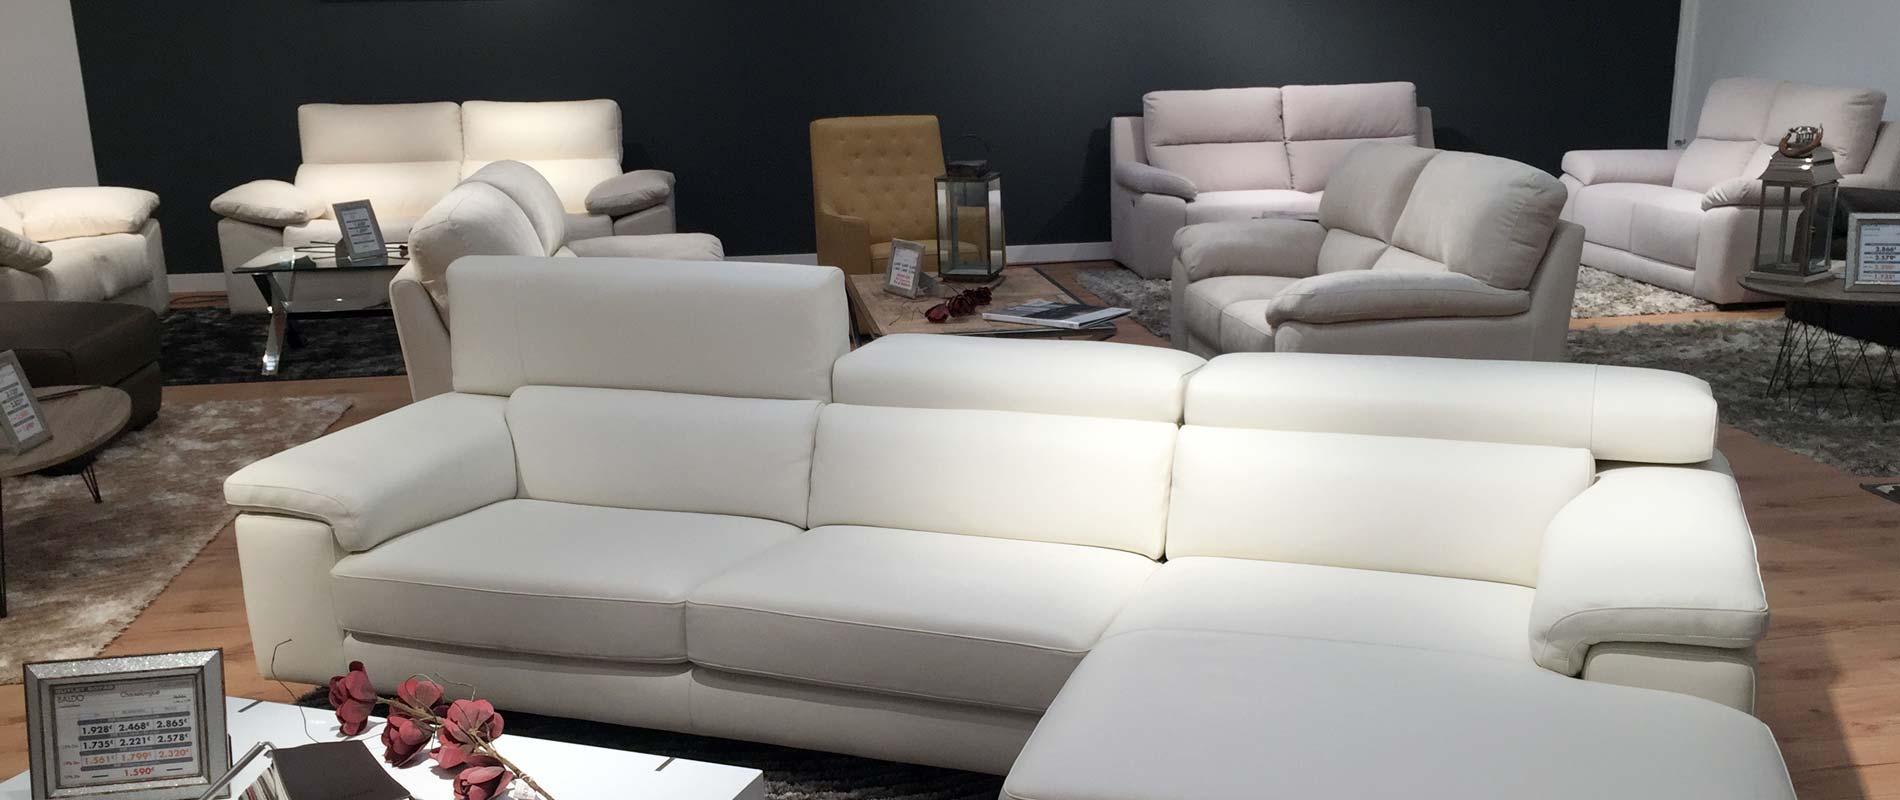 Europolis las rozas sofas trendy cool oferta por for Outlet muebles las rozas